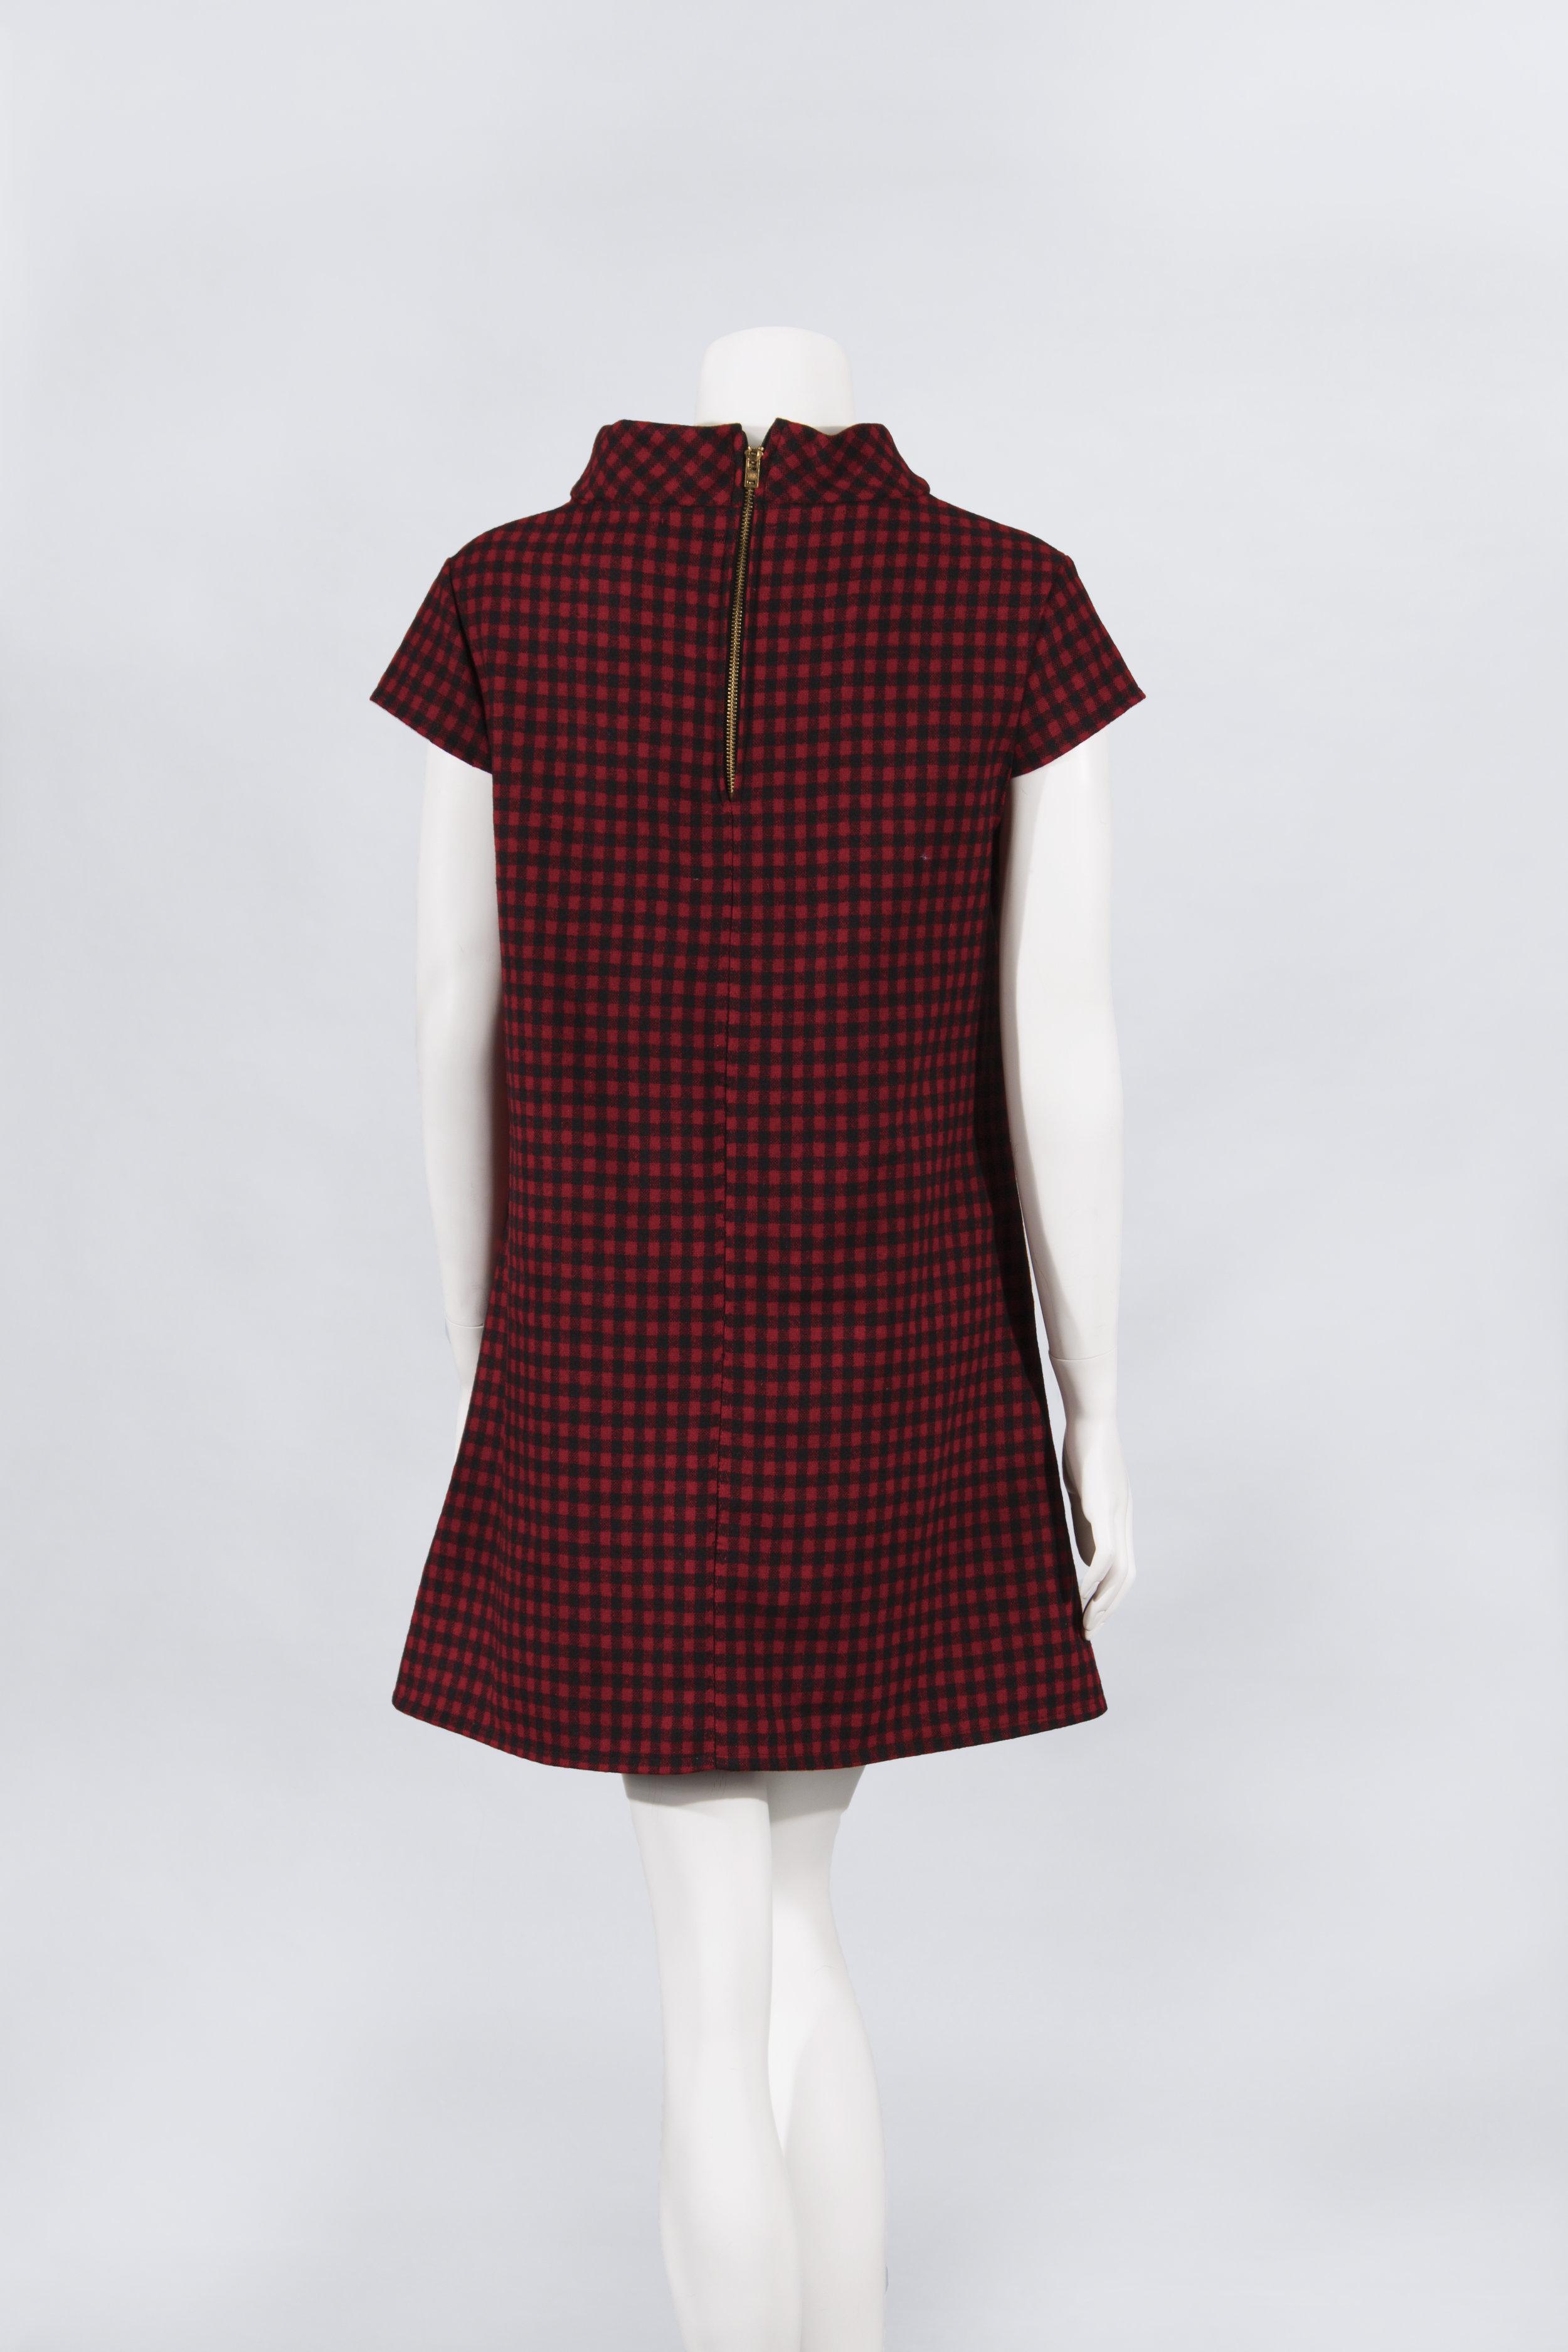 Dress 6 Back.jpg